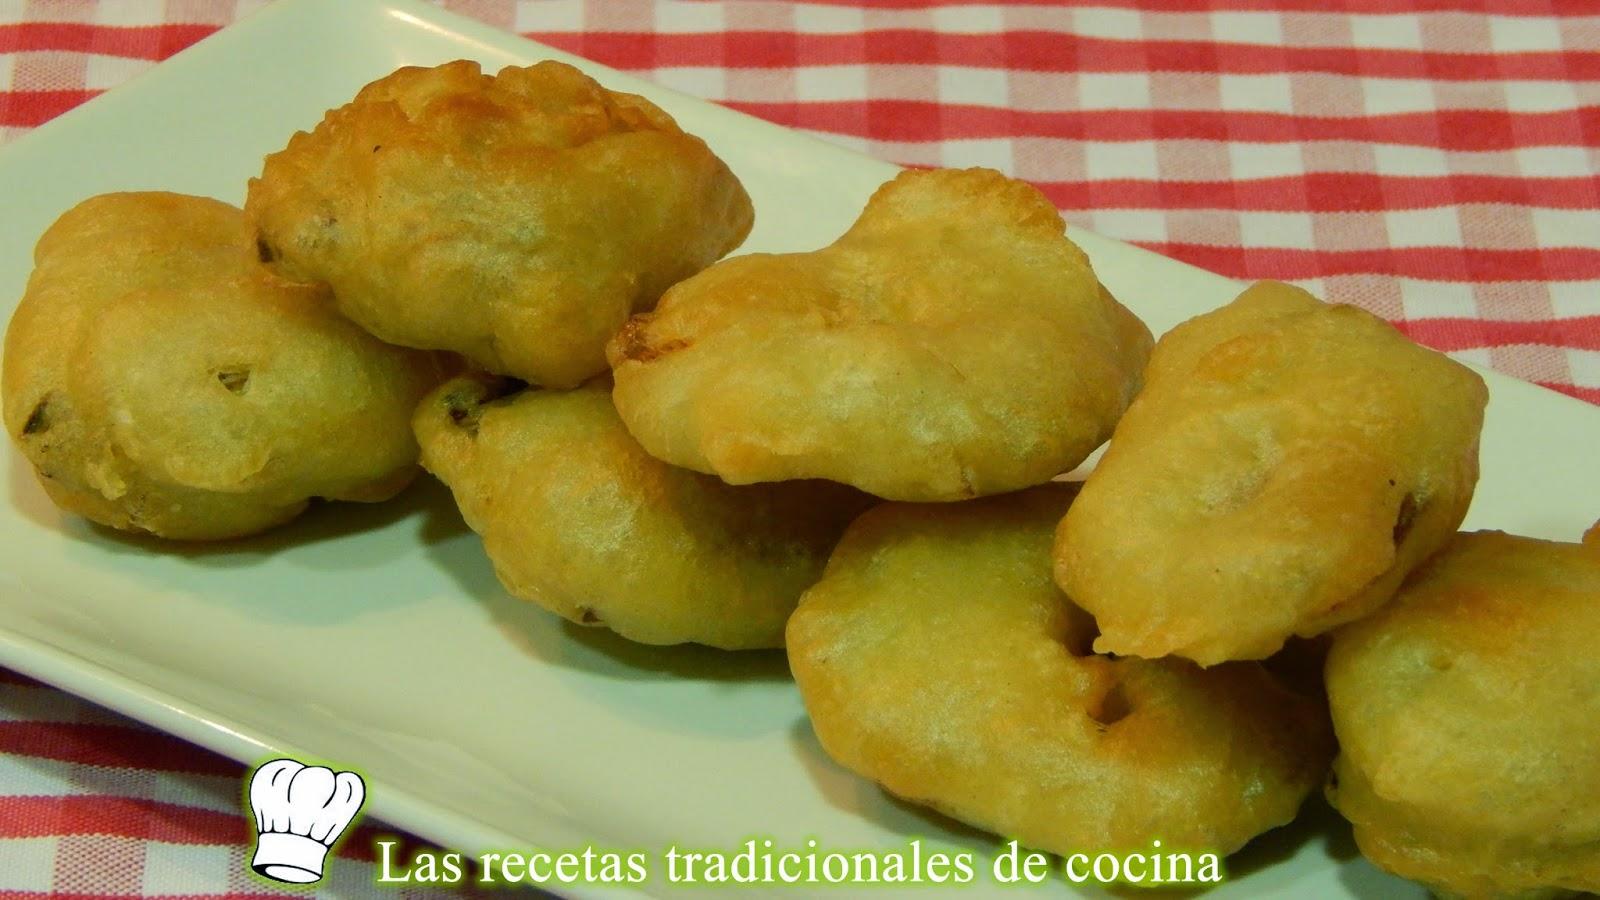 Recetas De Cocina Con Sabor Tradicional Receta De